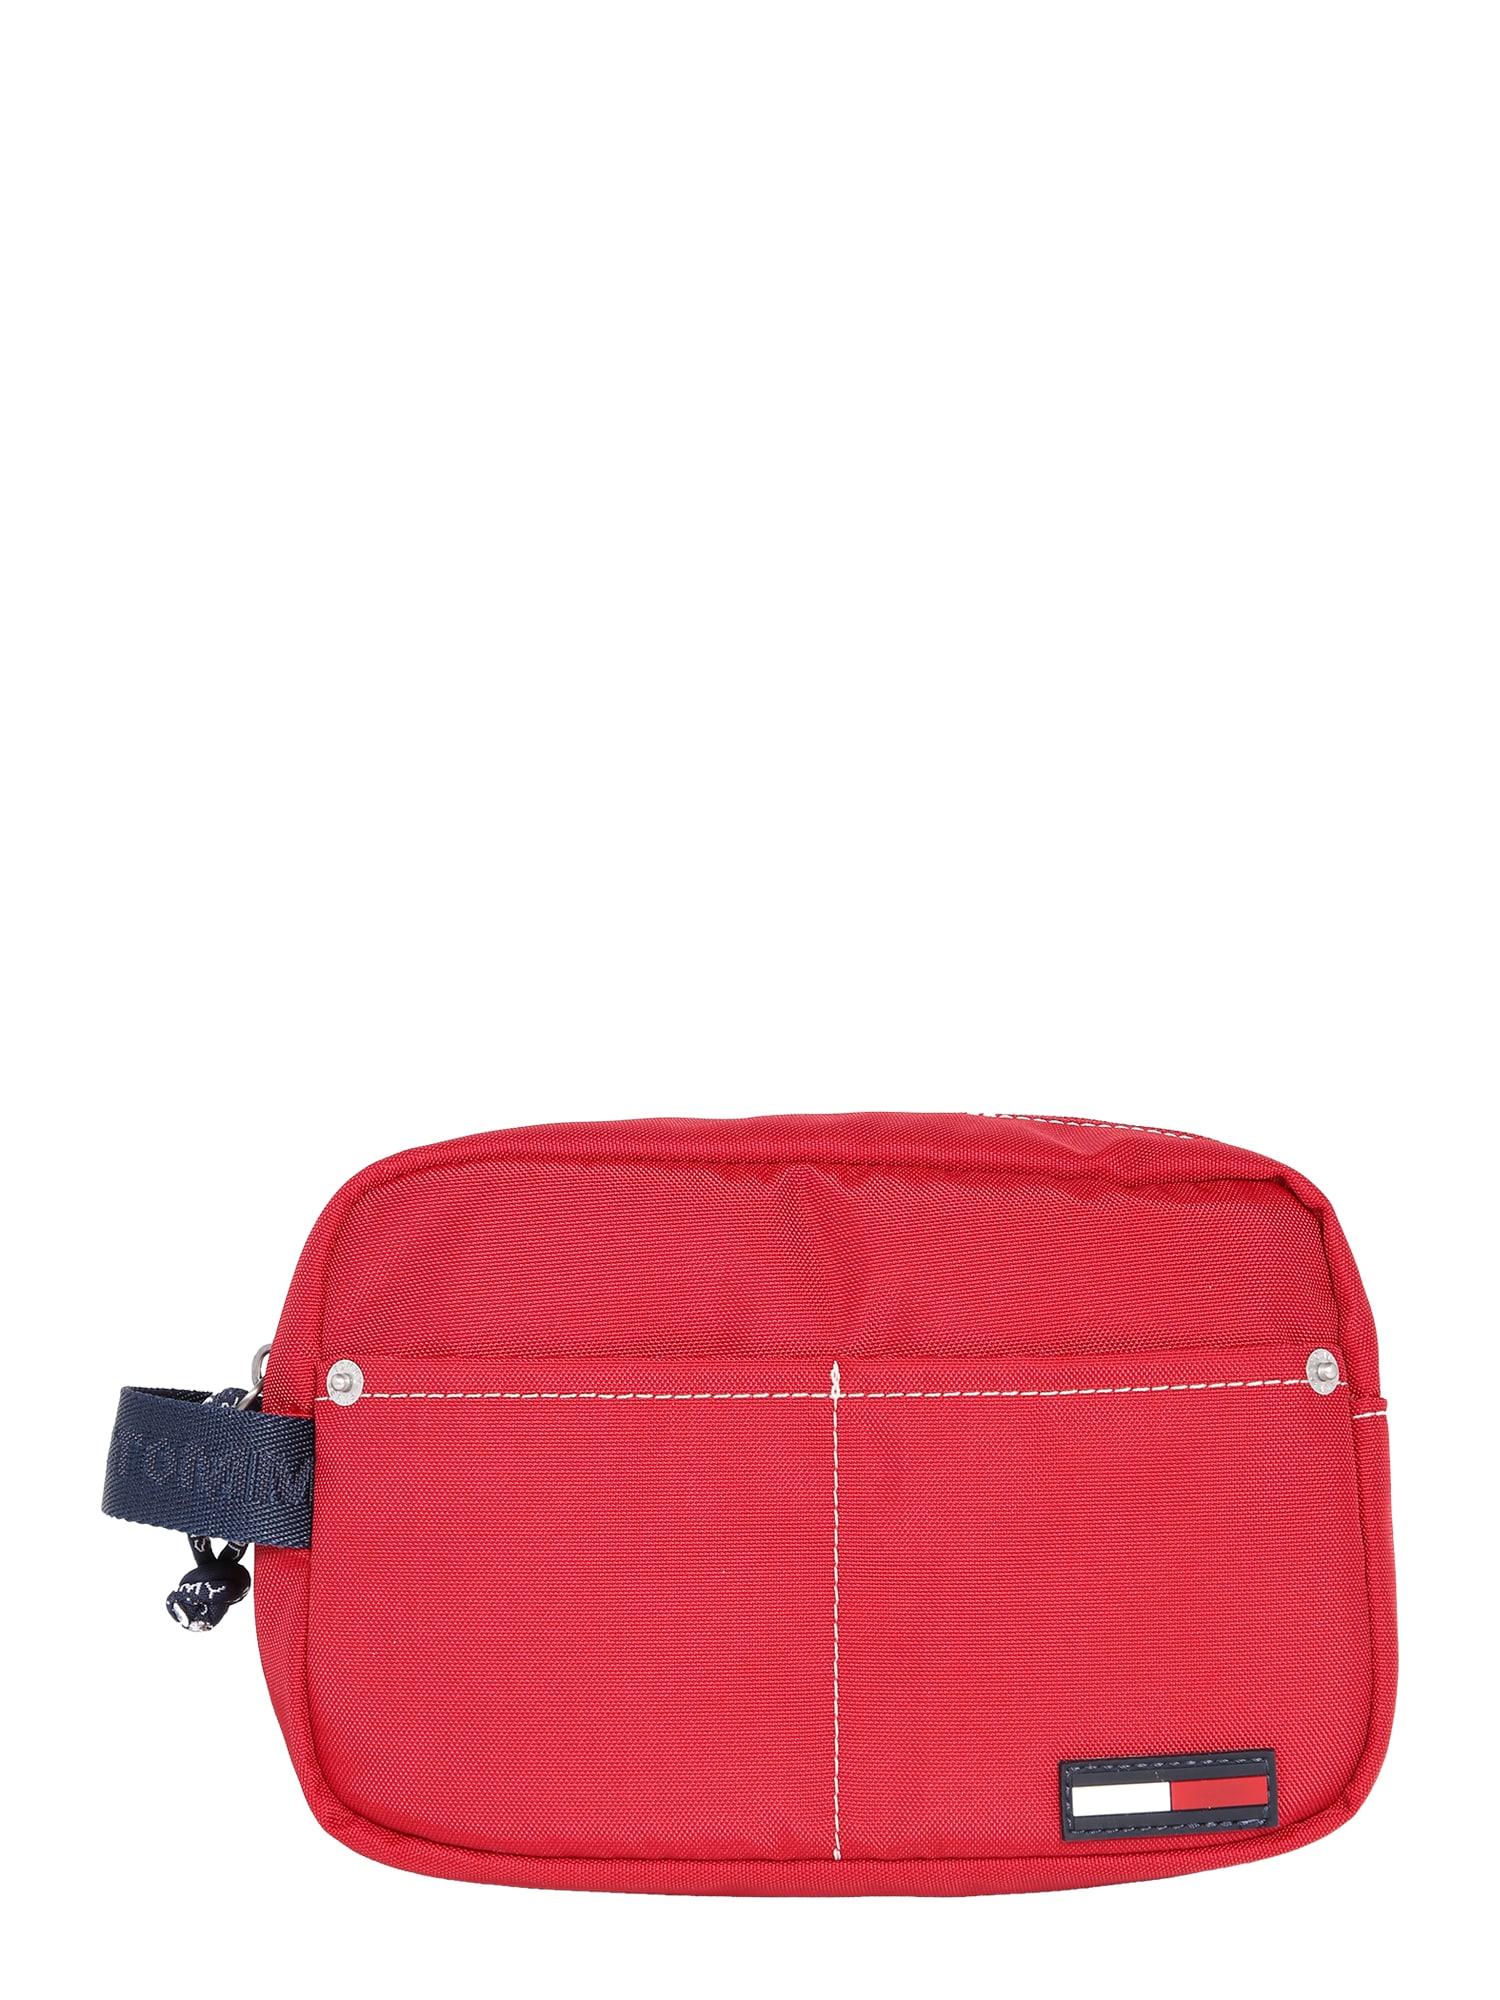 Tommy Jeans Tualeto reikmenų / kosmetikos krepšys